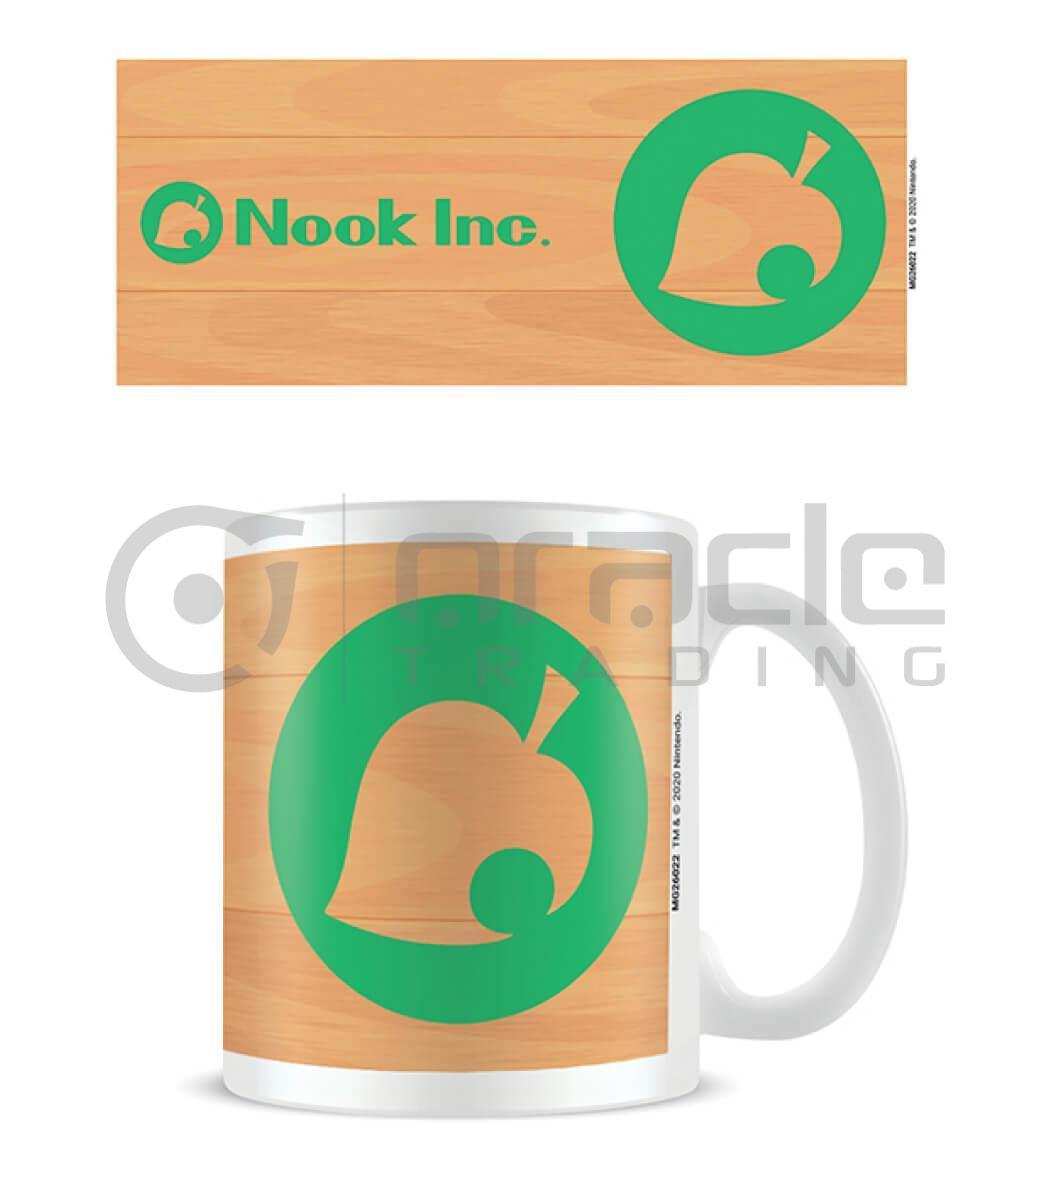 Animal Crossing Mug - Nook Inc.